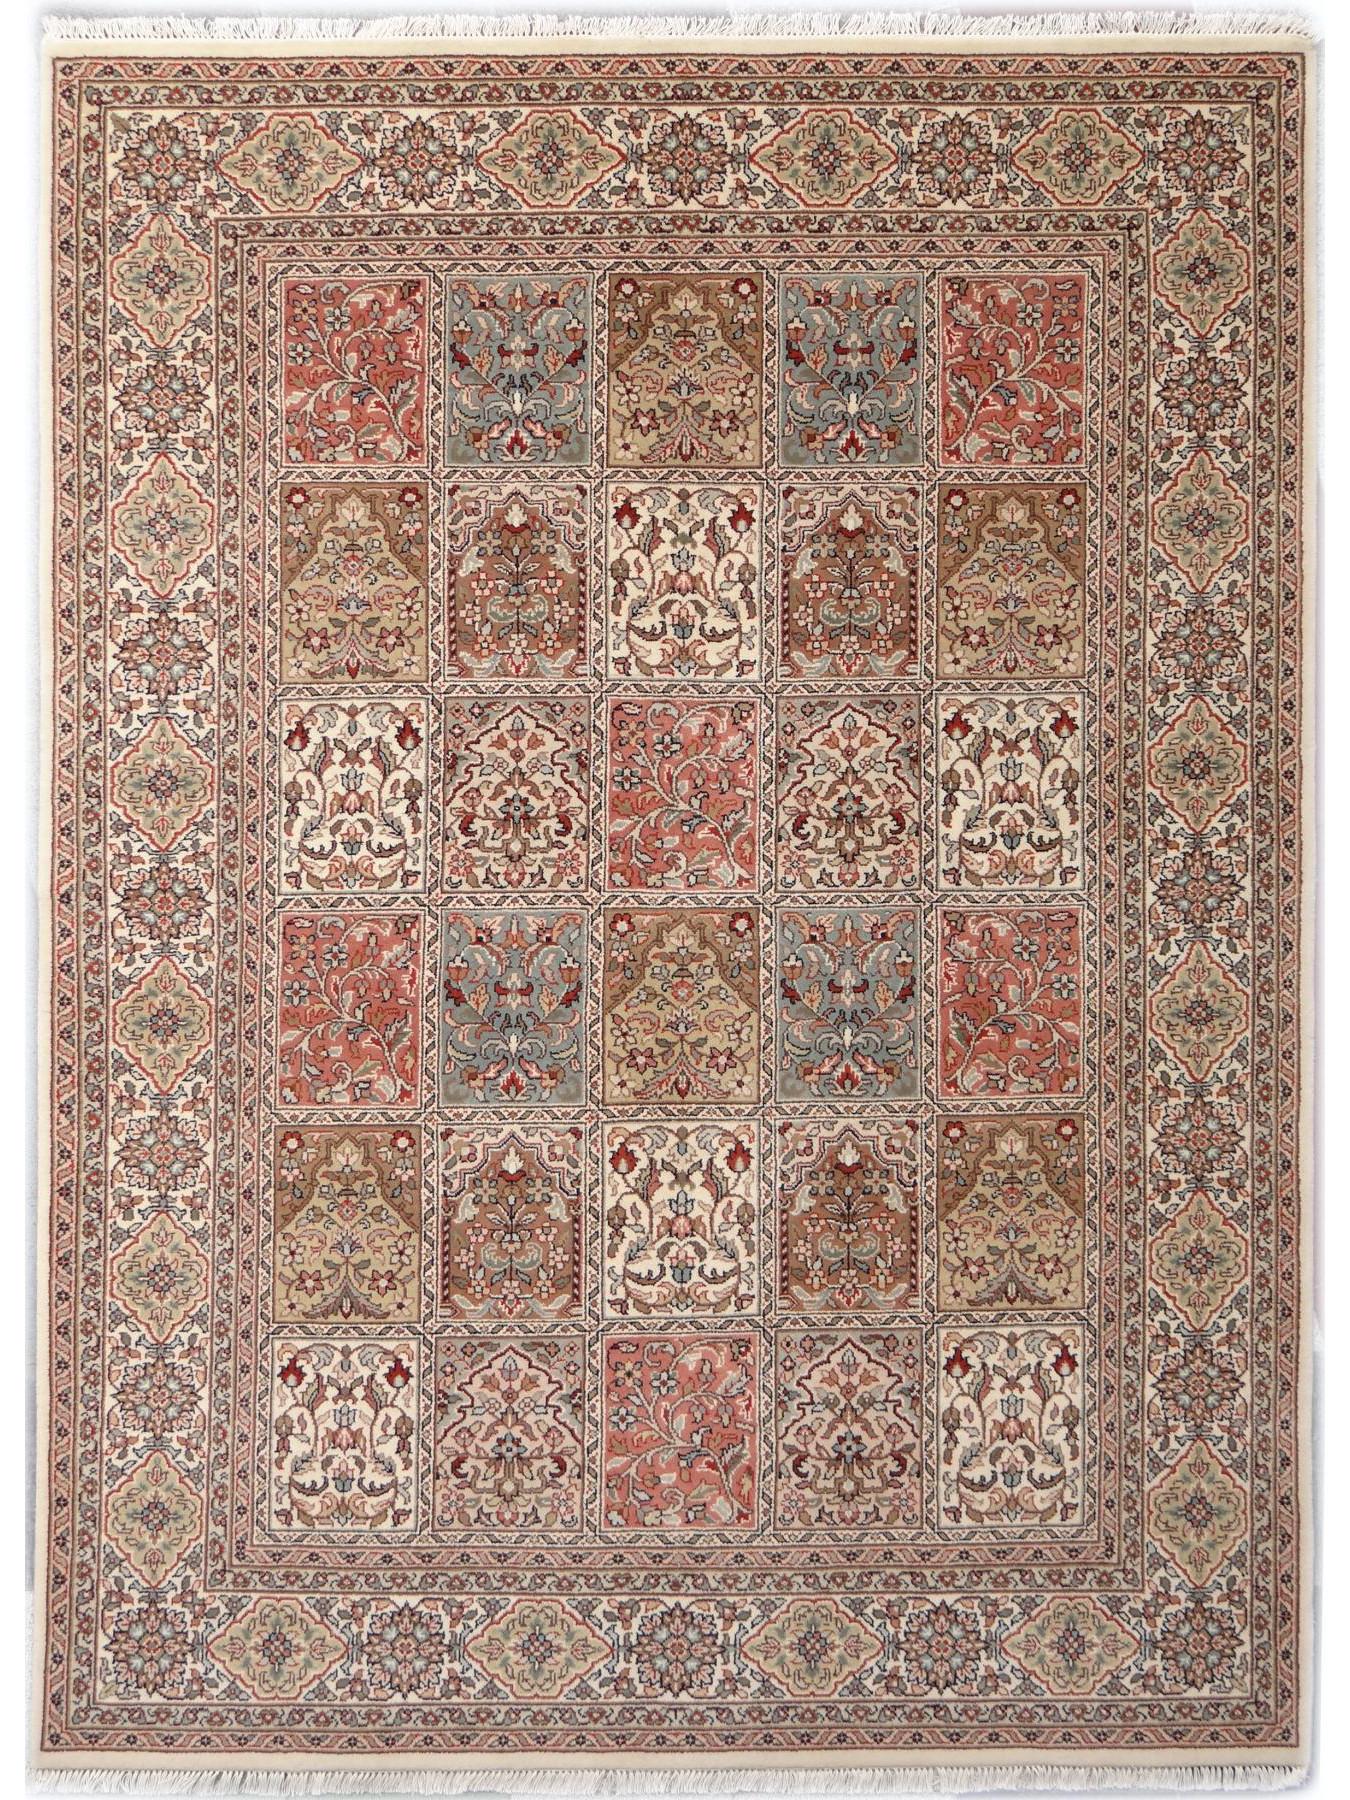 bakthiari jardin tapis classiques n 29931 233x171cm. Black Bedroom Furniture Sets. Home Design Ideas